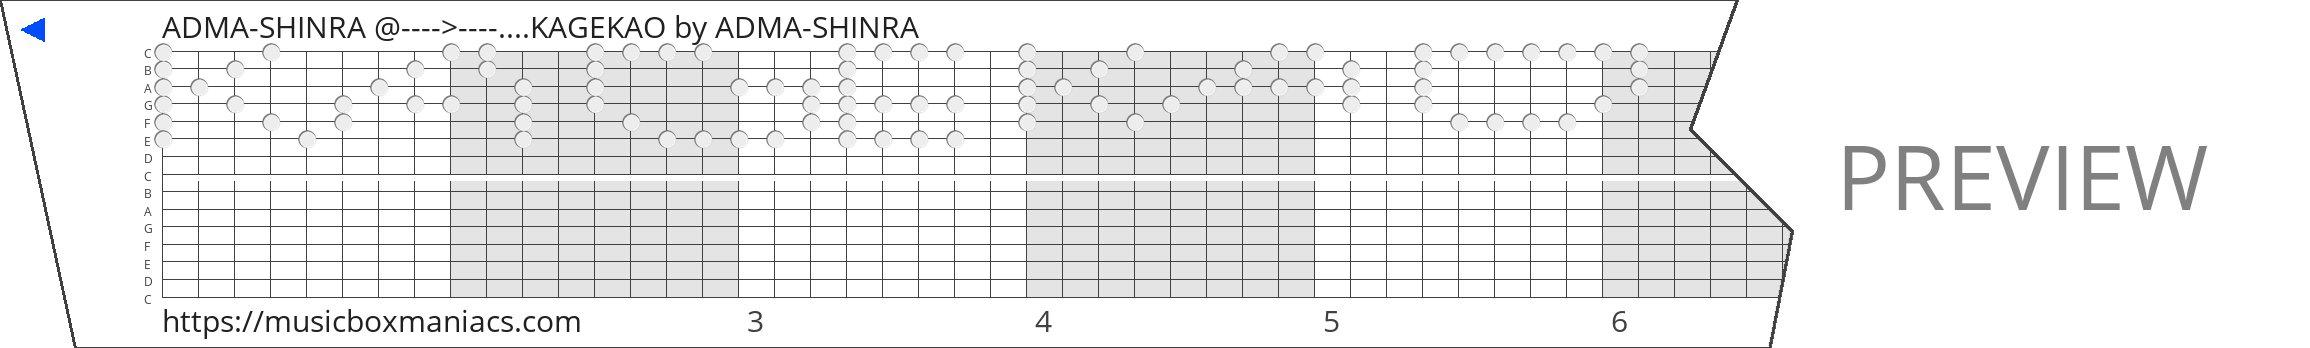 ADMA-SHINRA @---->----....KAGEKAO 15 note music box paper strip